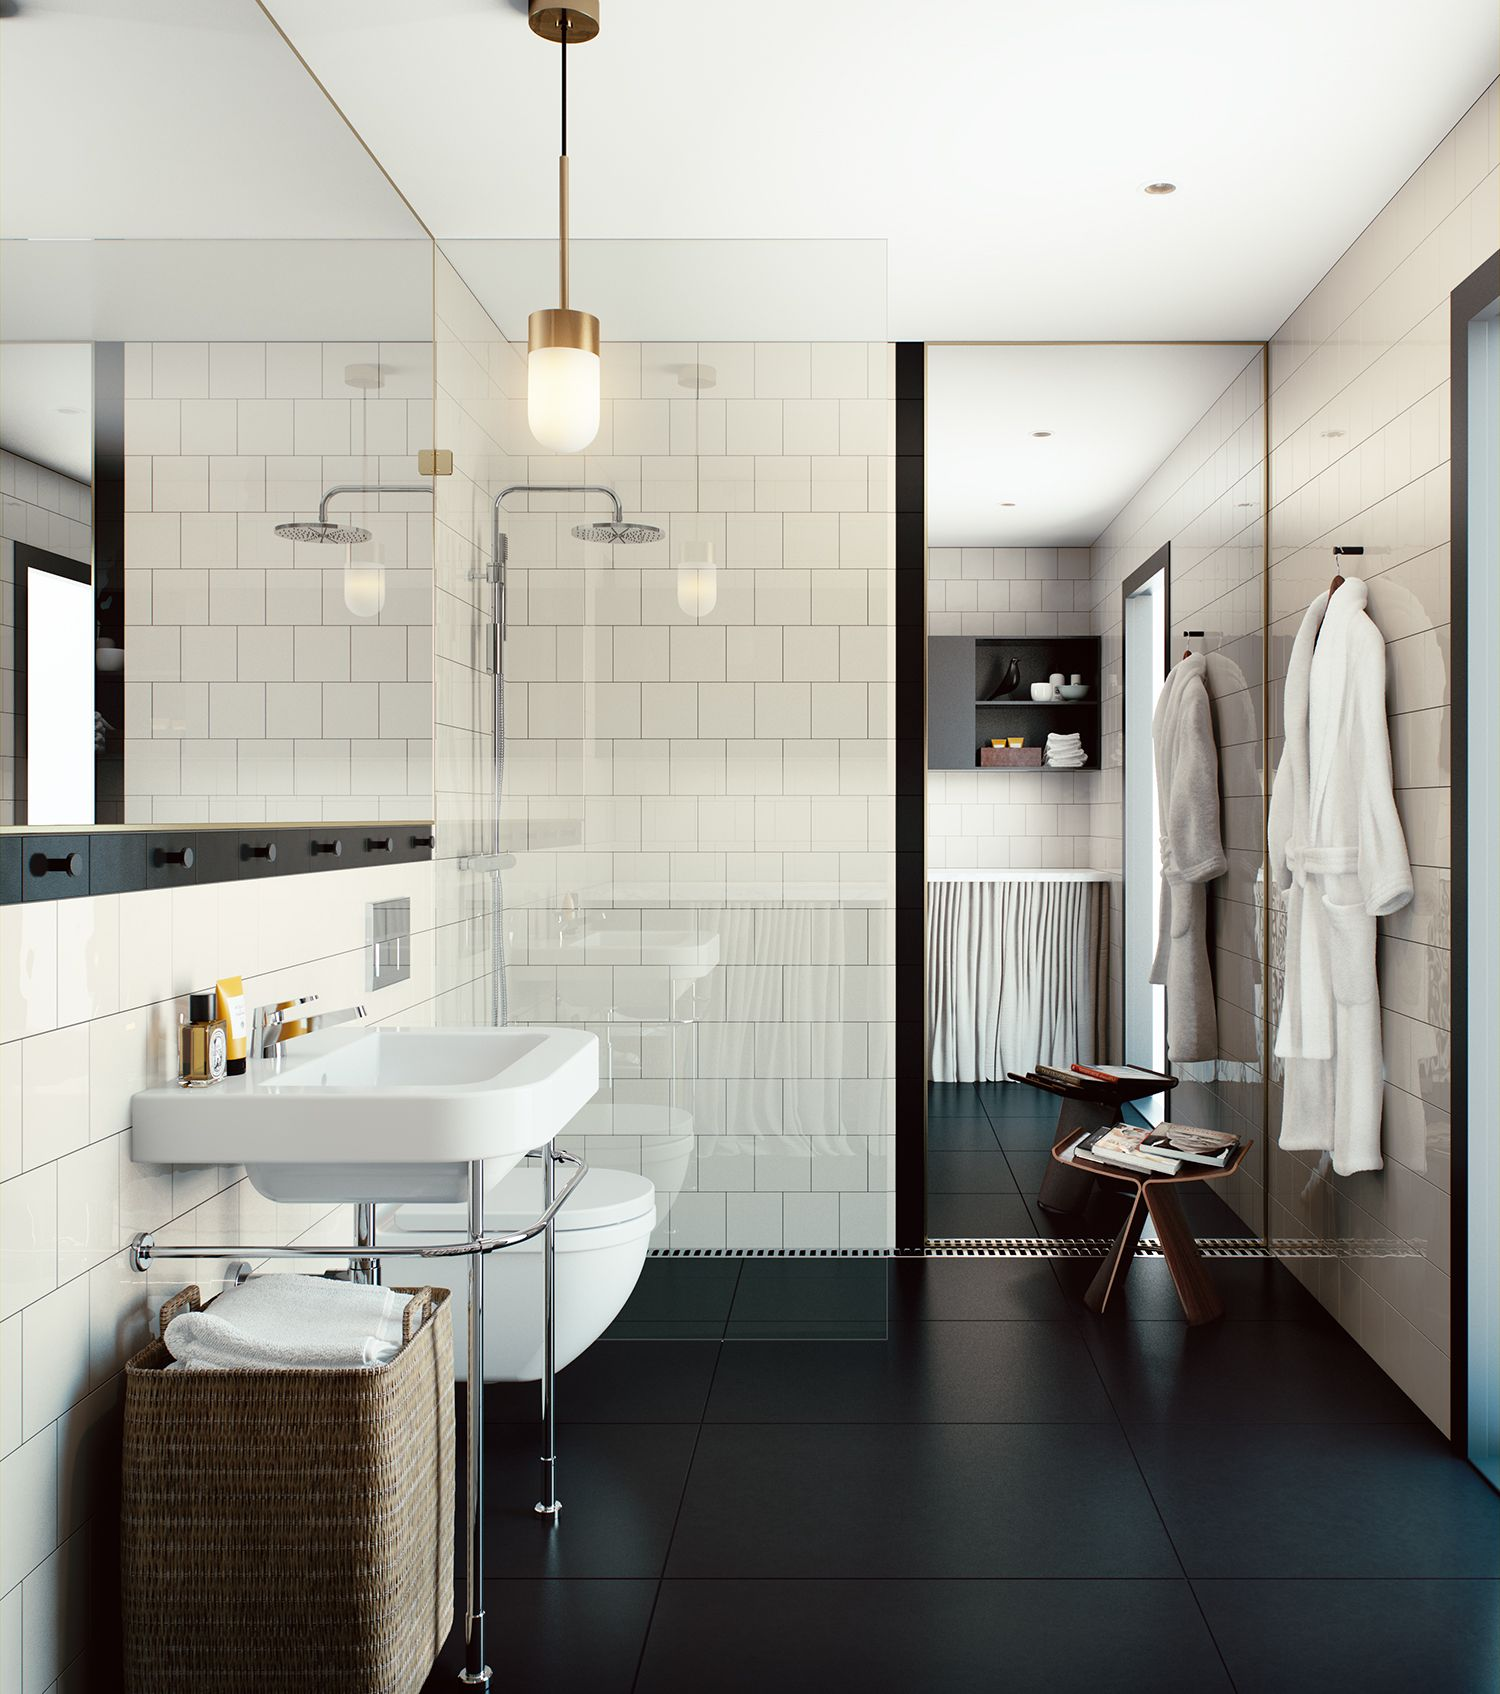 Clean and simple | Modern Spanish Bath | Pinterest | Toilet, Bath ...